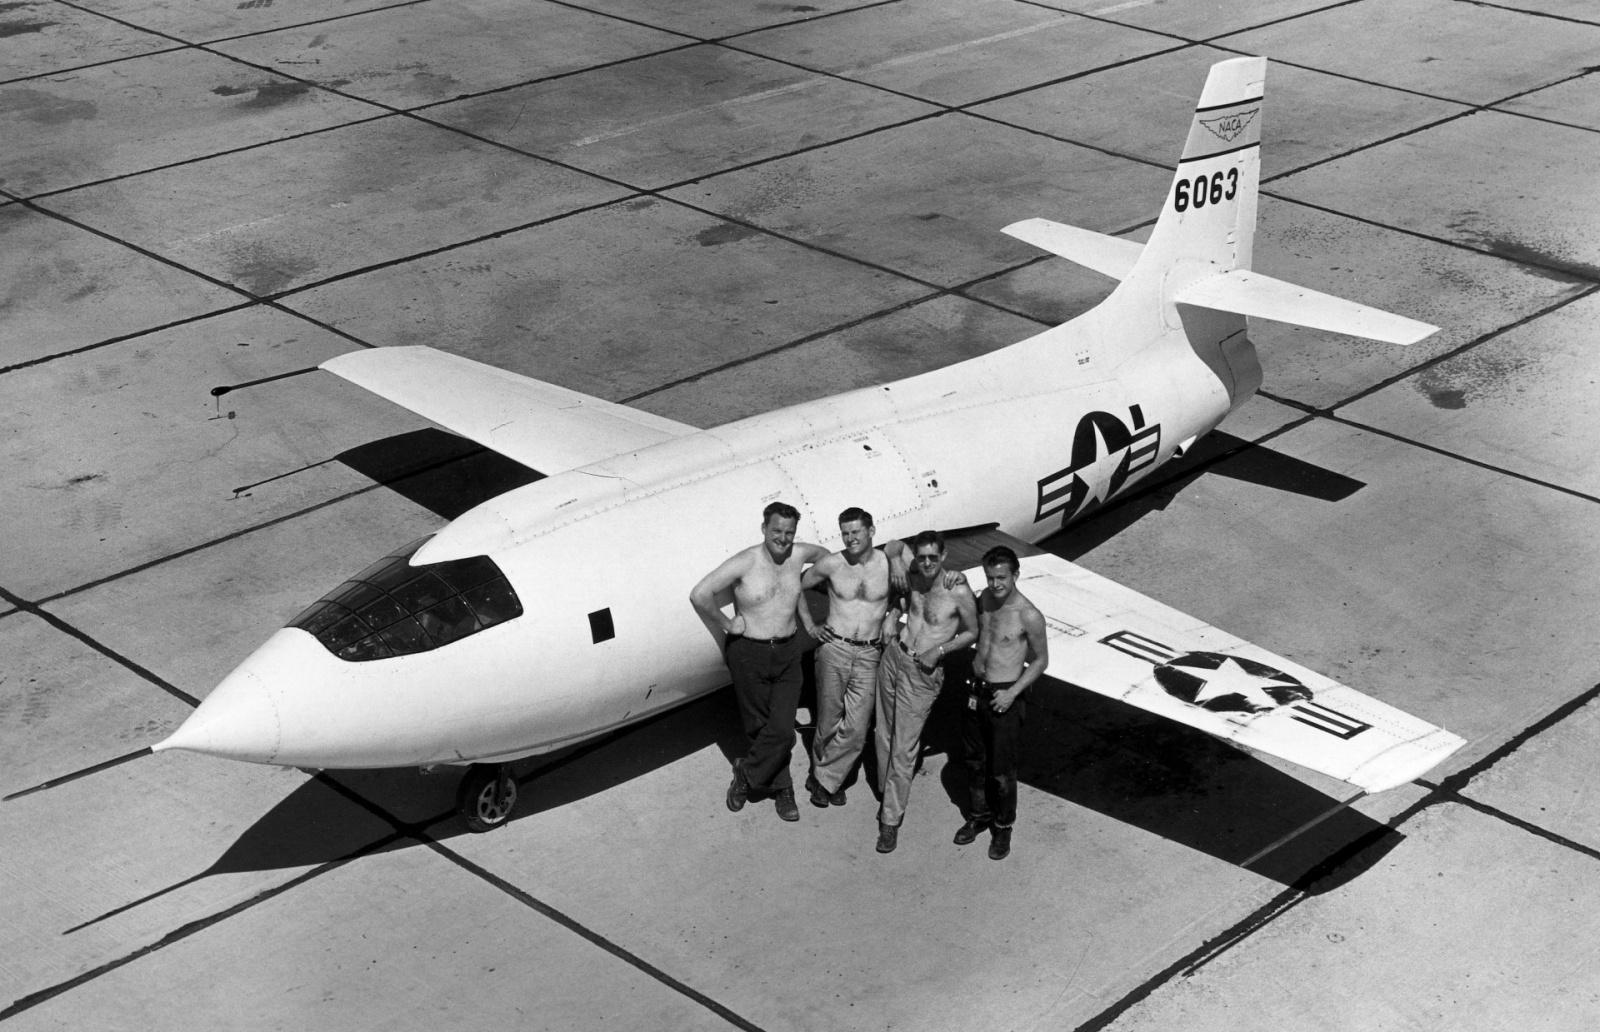 НАСА анонсировало электрический самолёт X-57 Maxwell - 2